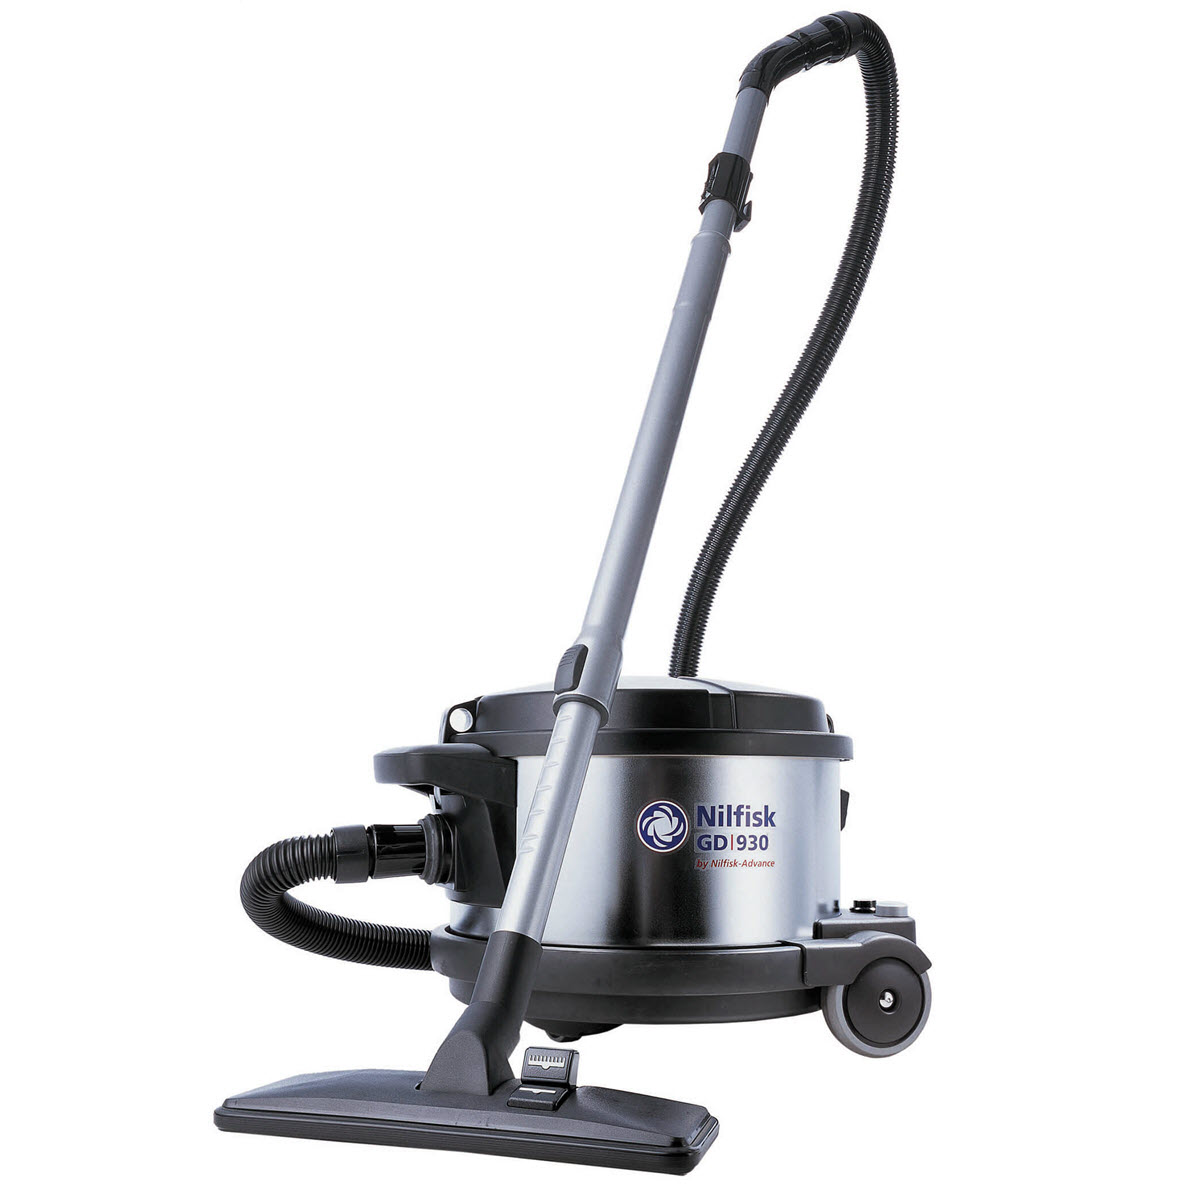 Nilfisk® Industrial Canister HEPA Vacuum (GD930)